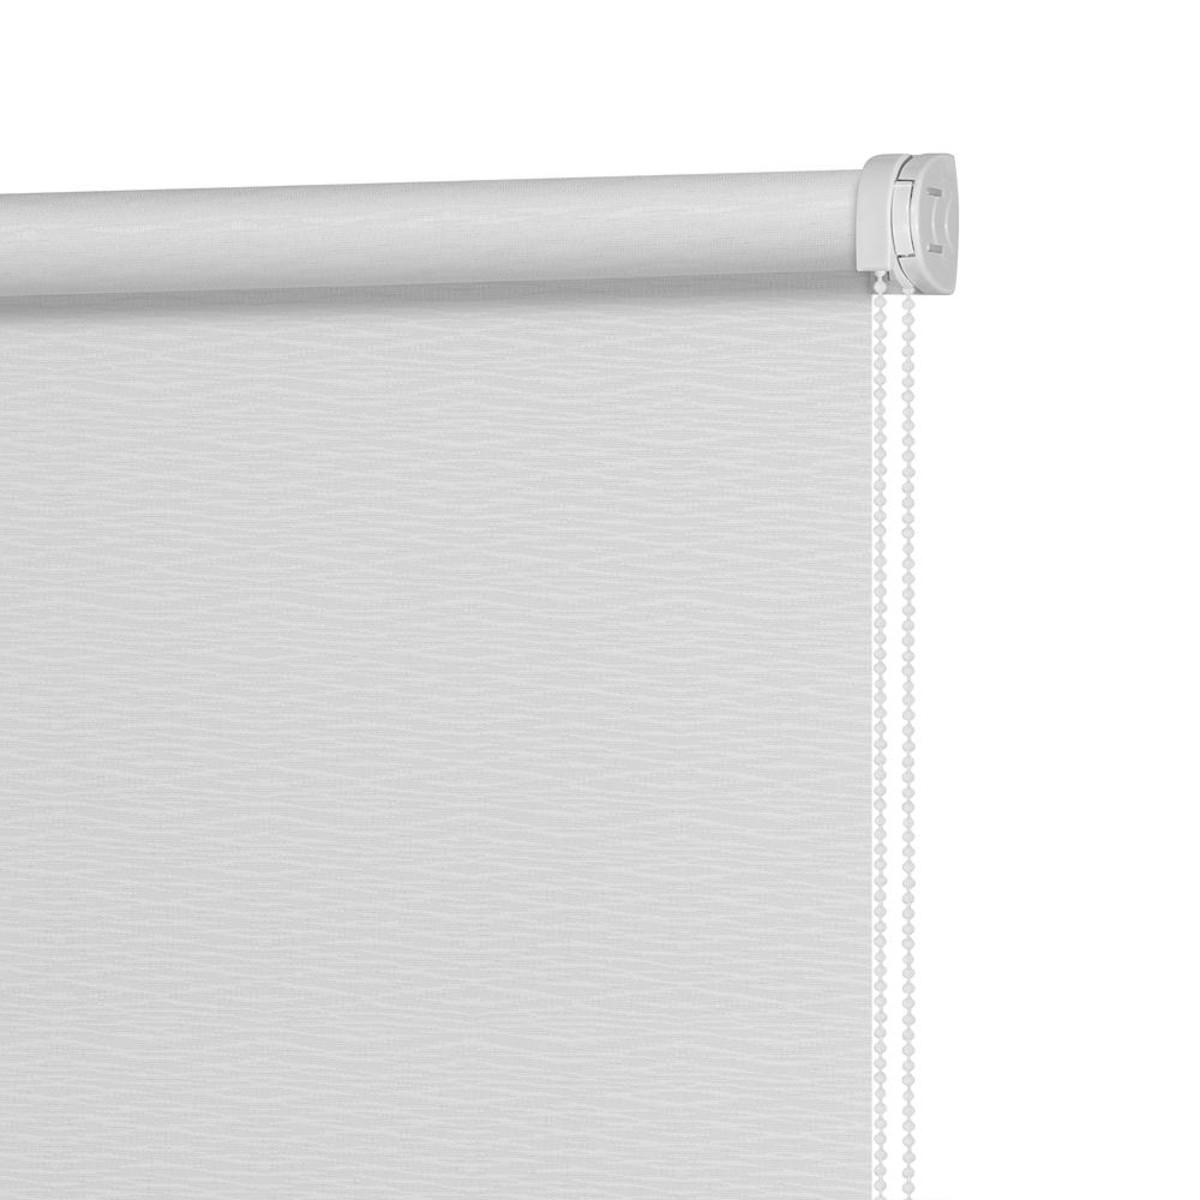 Рулонная Ора Decofest Маринела 90Х160 Цвет Серый